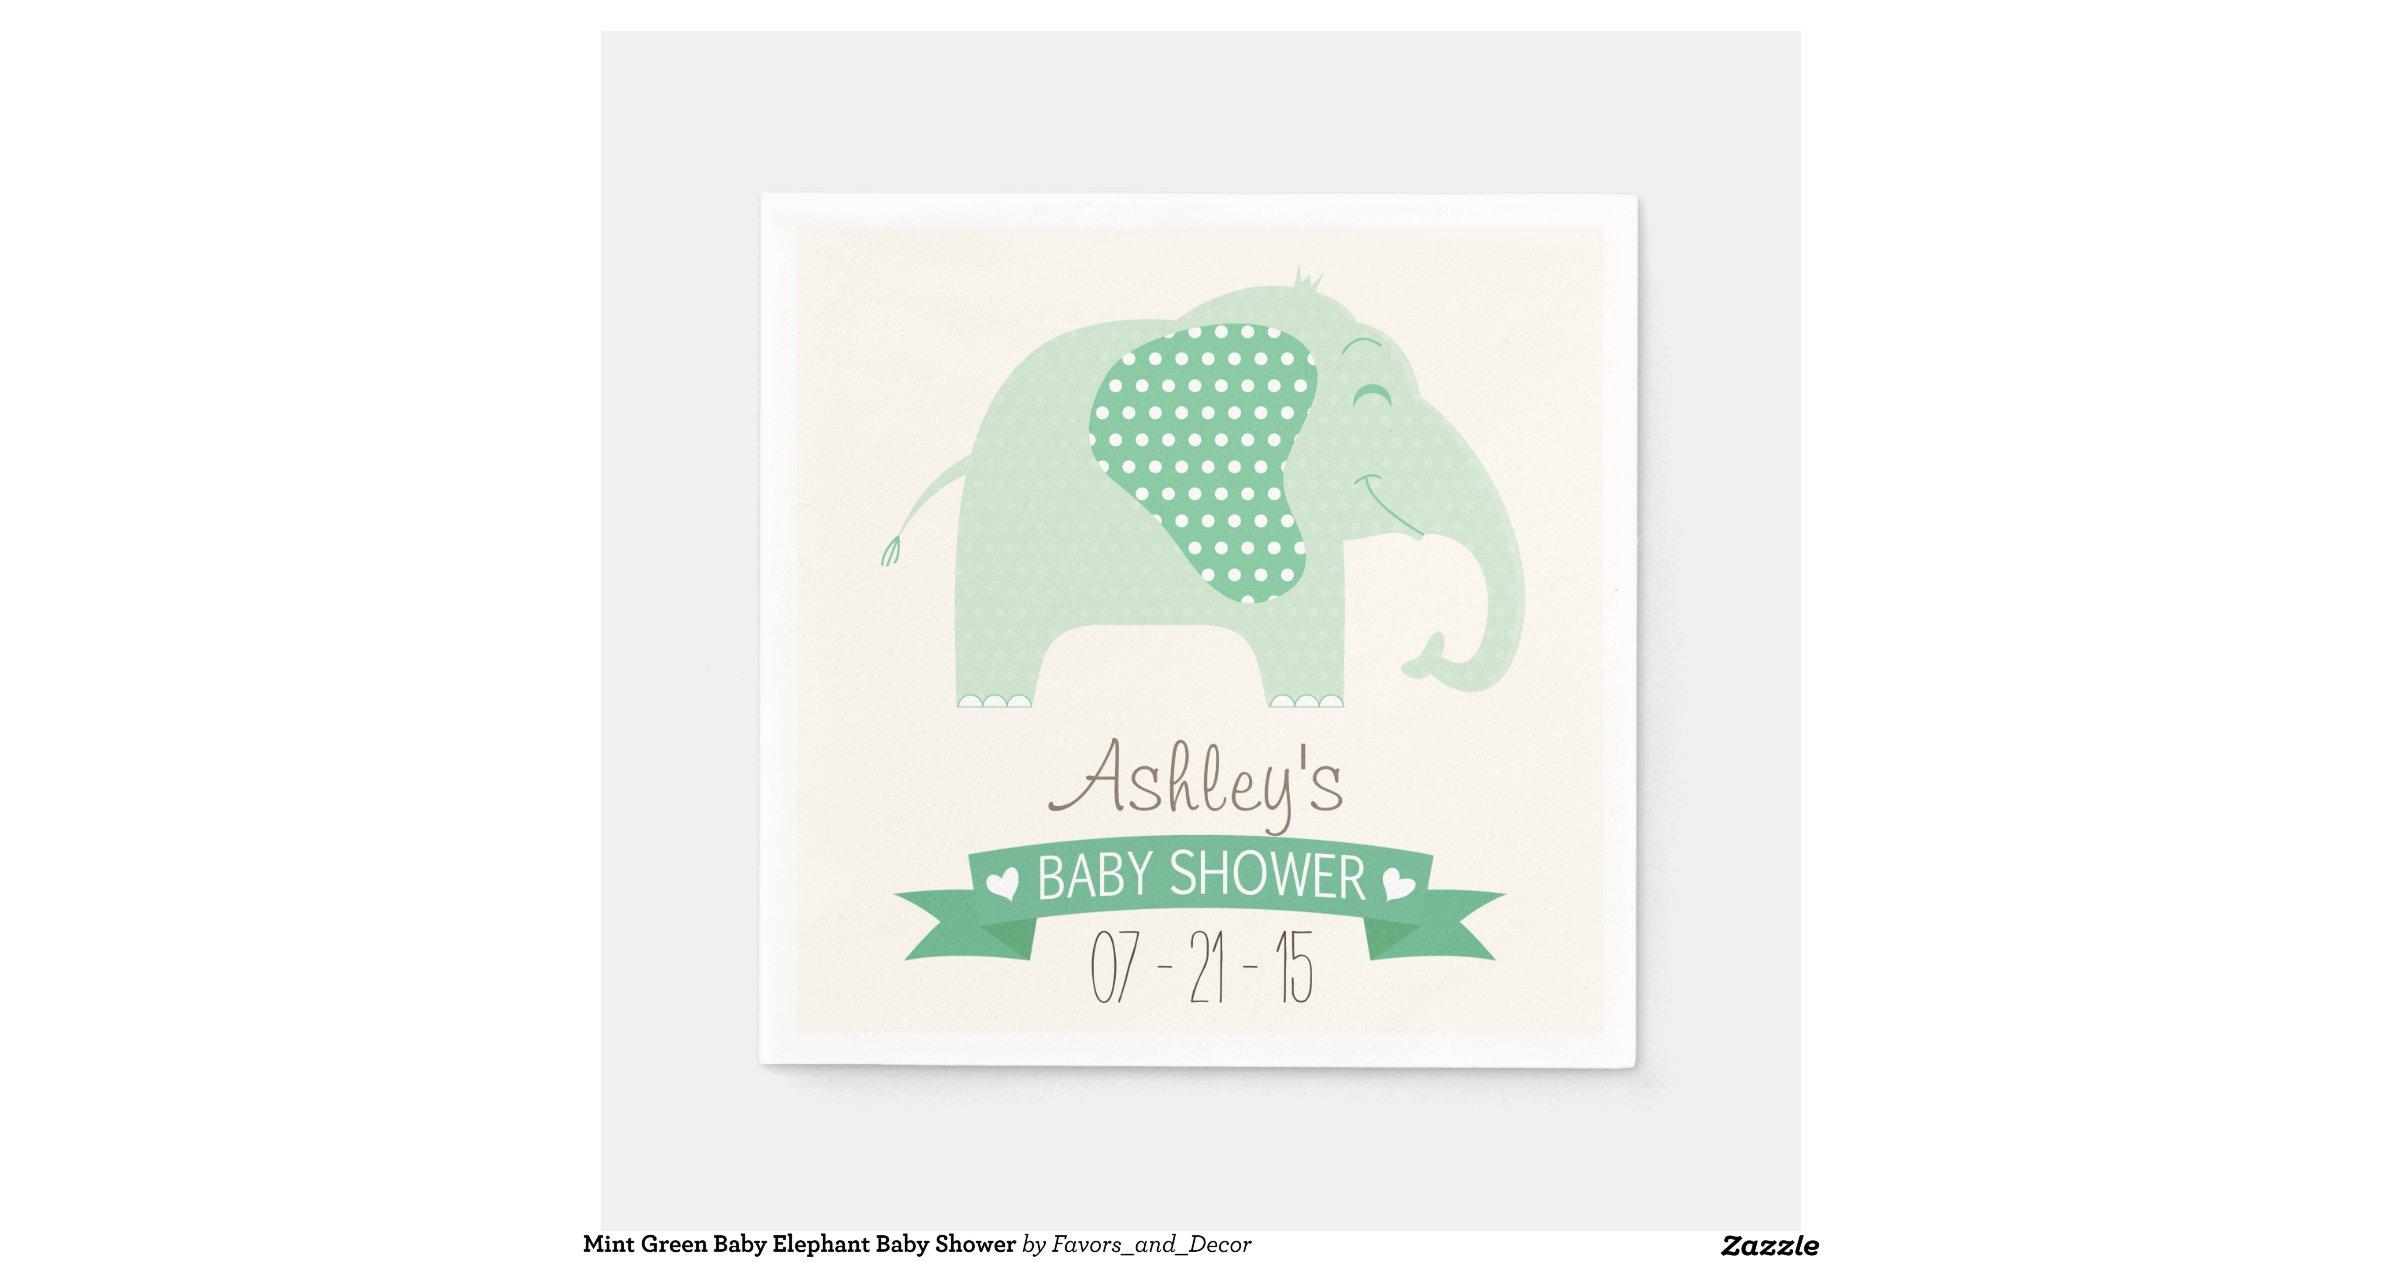 mint green baby elephant baby shower standard cocktail napkin zazzle